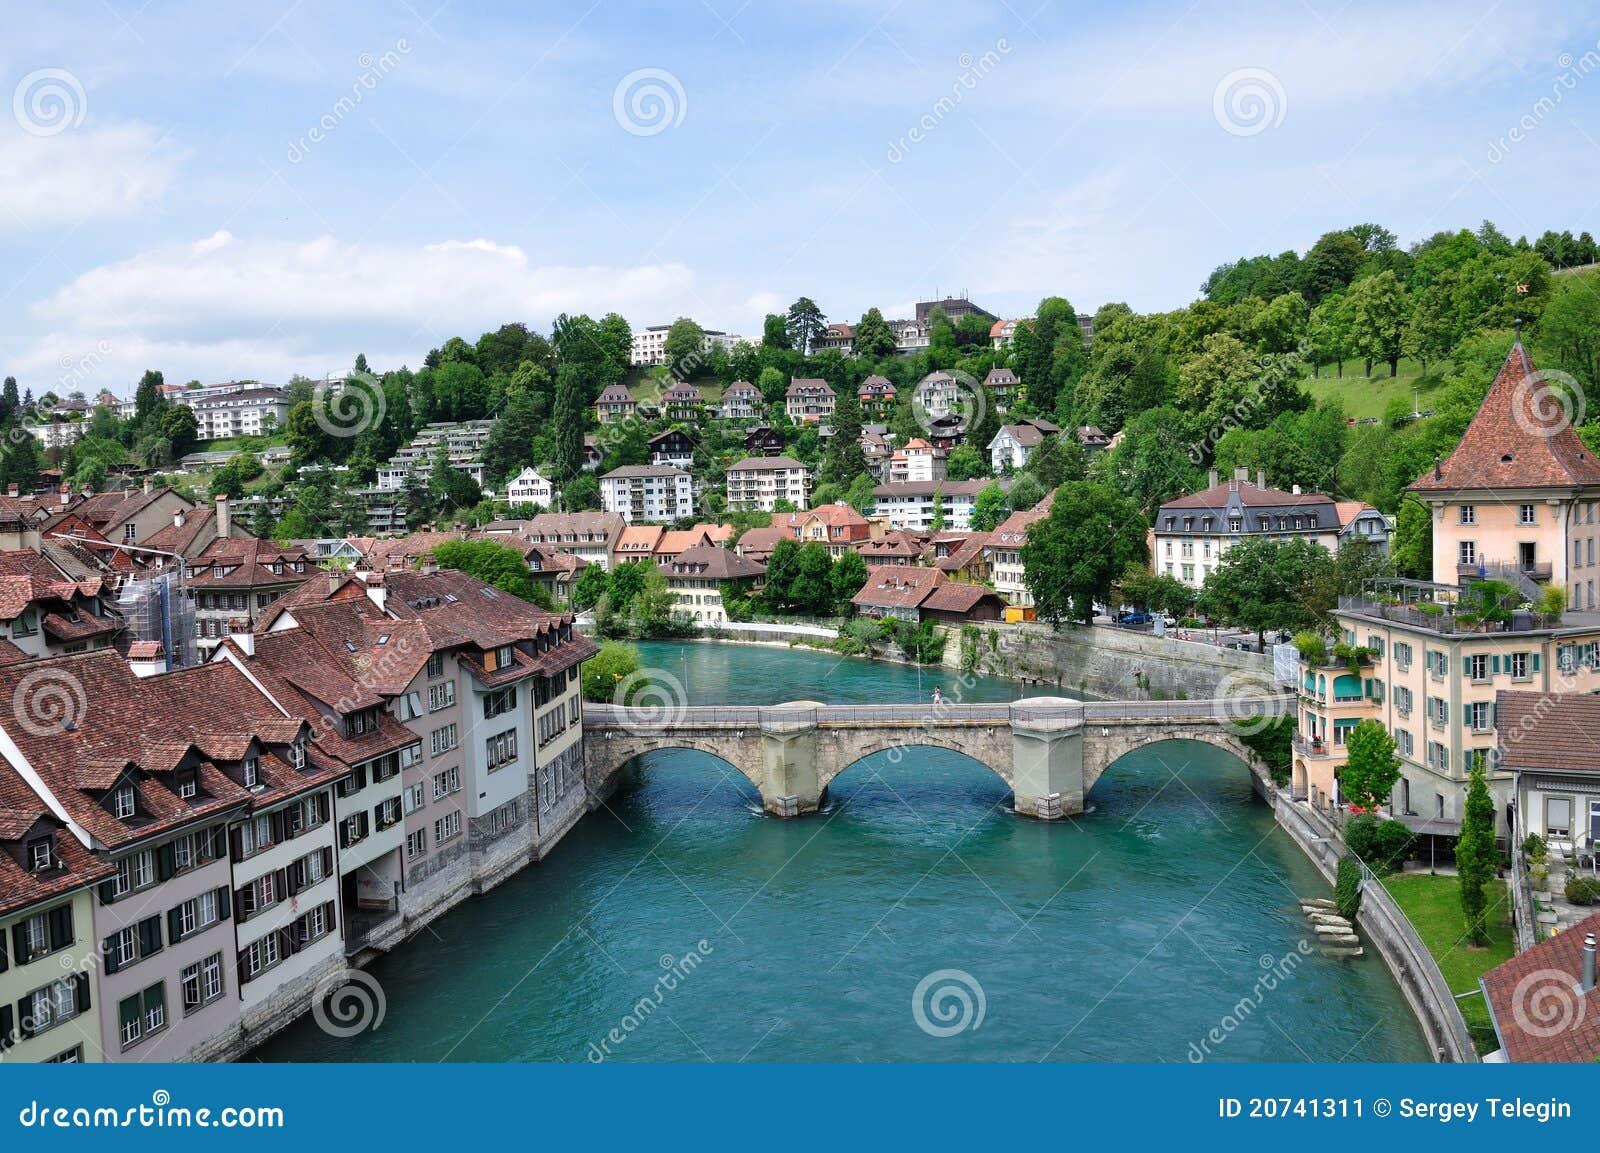 Old town of Bern, Switzerland